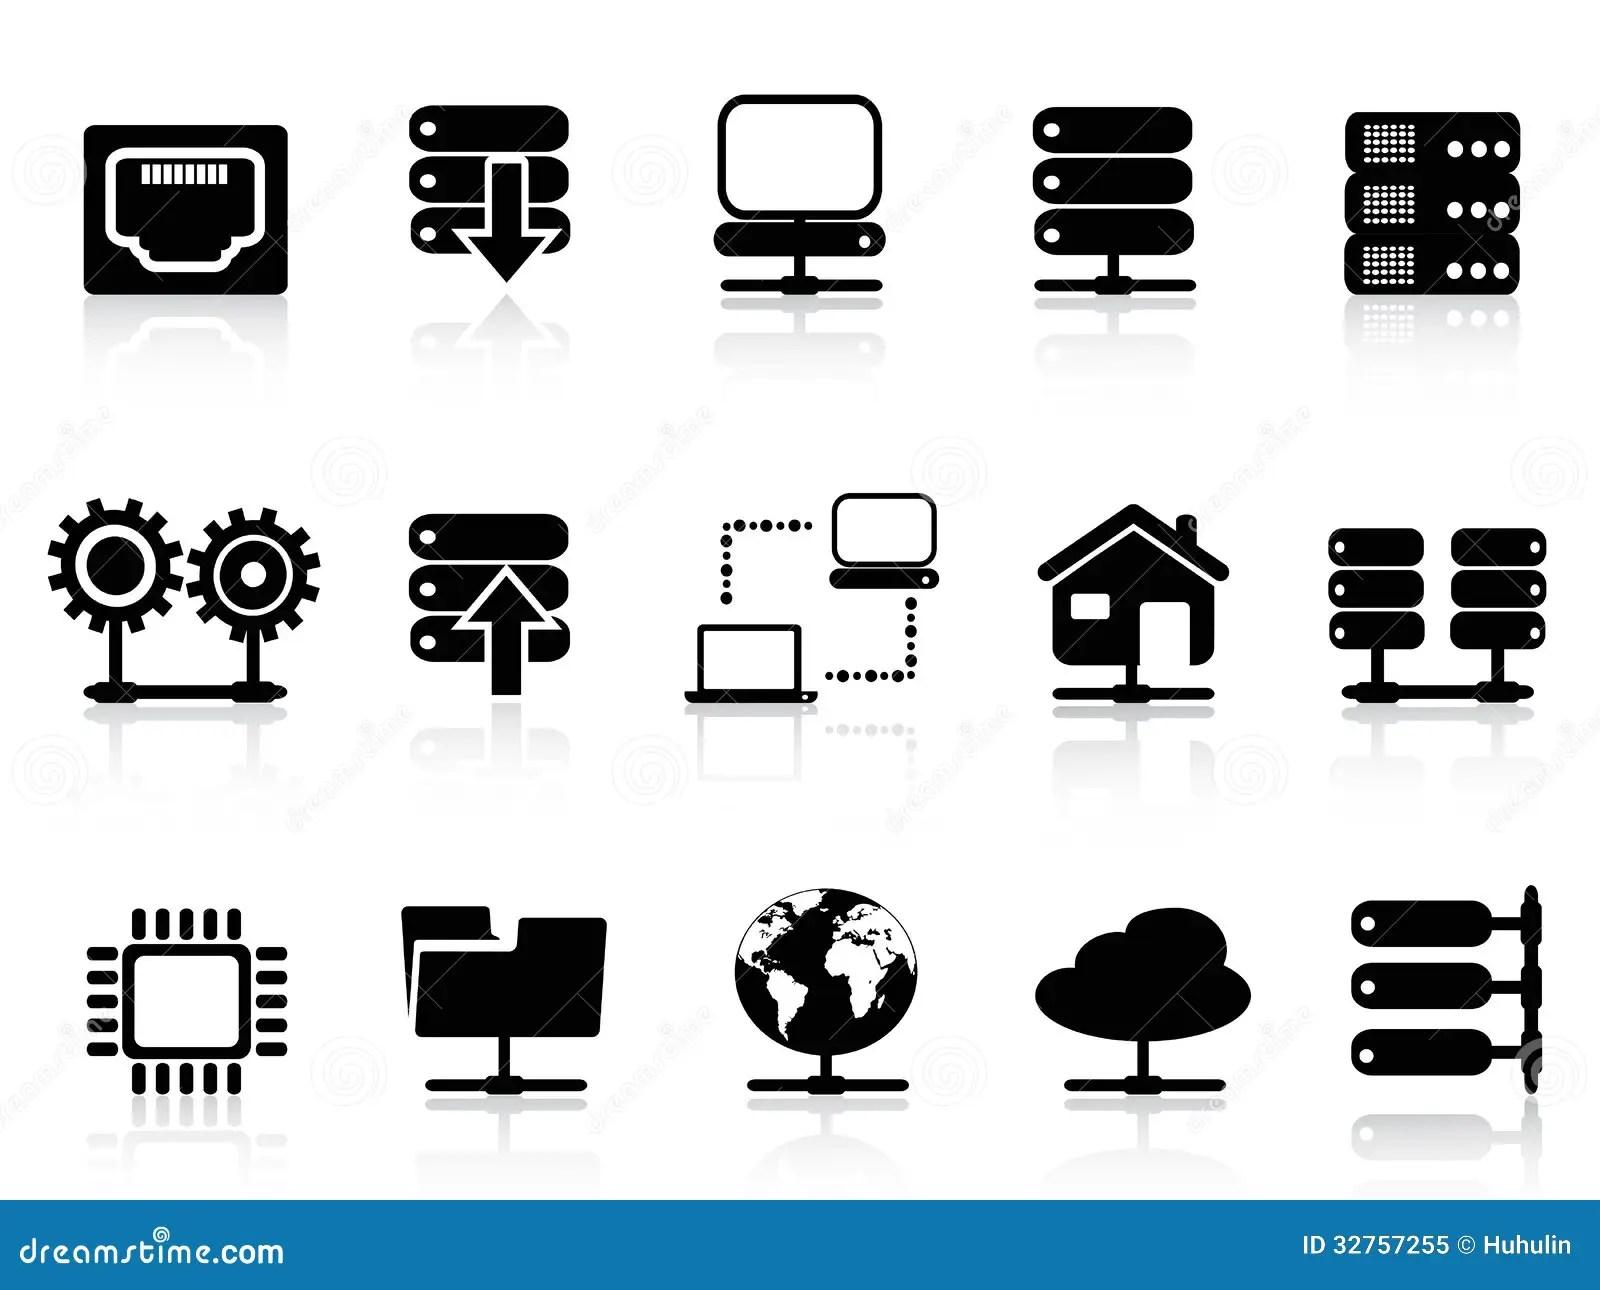 Server And Database Icon Royalty Free Stock Photo